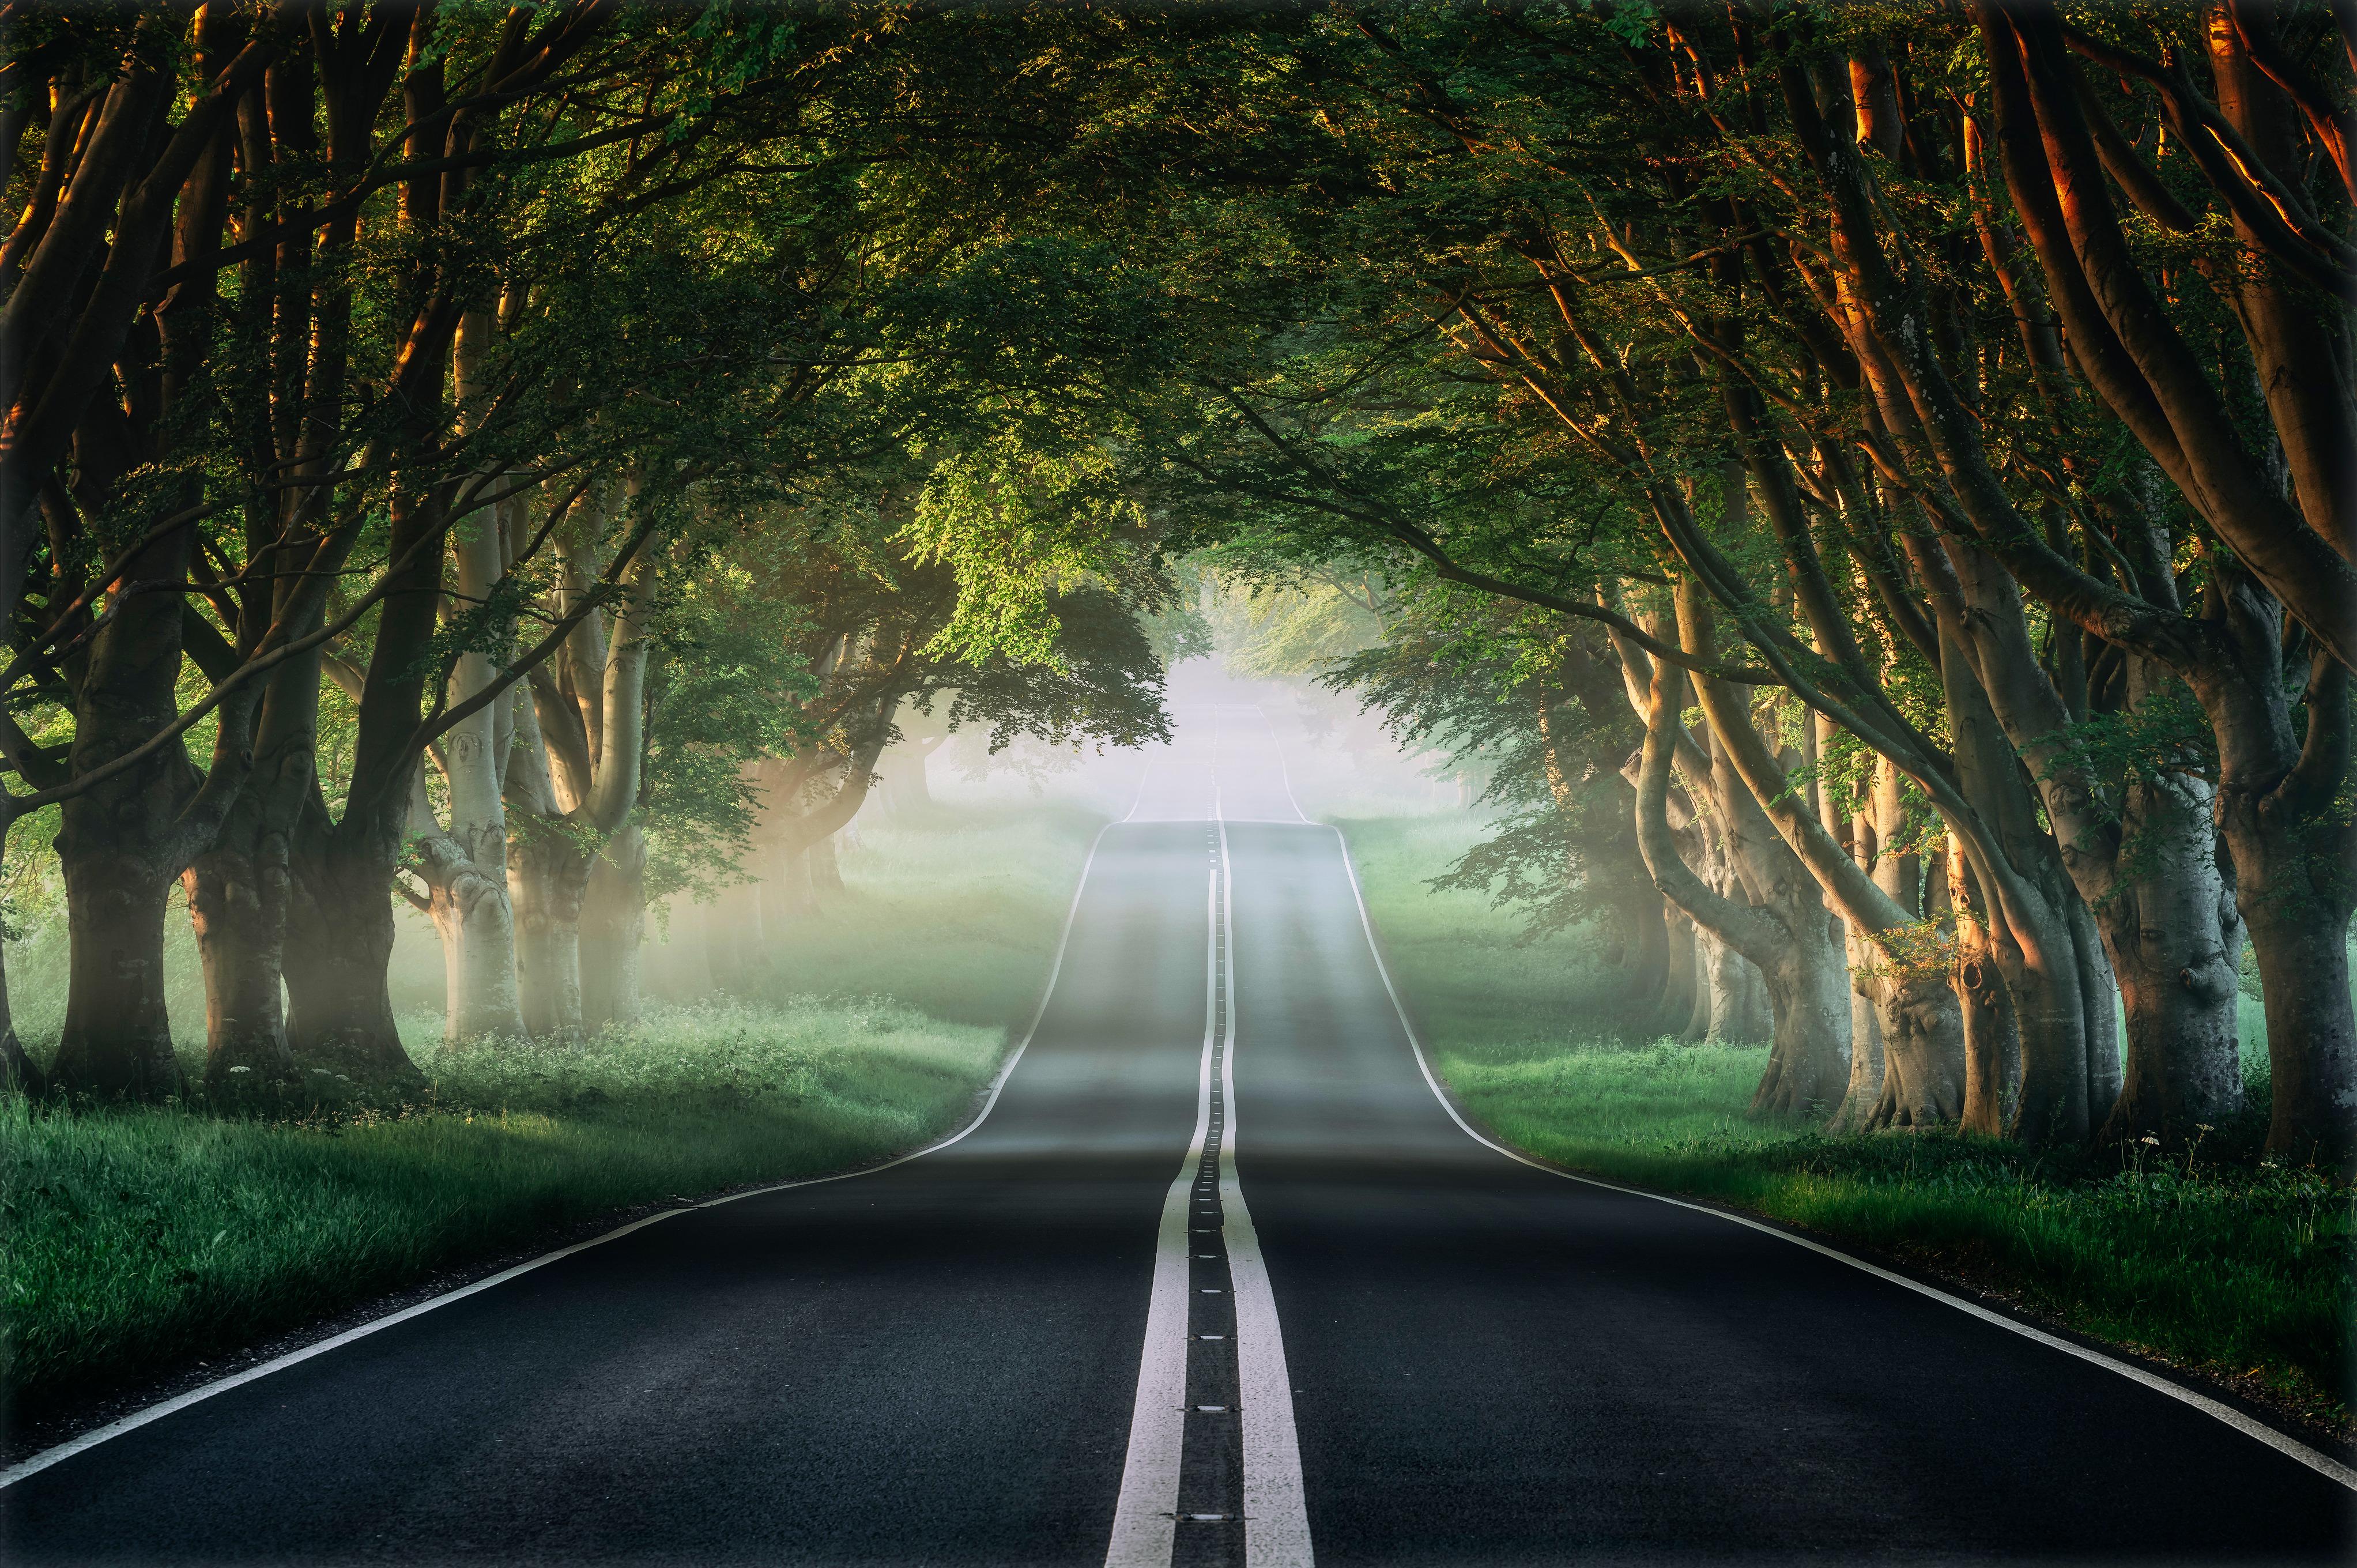 Landscape Photography 4089x2720 Wallpaper Teahub Io